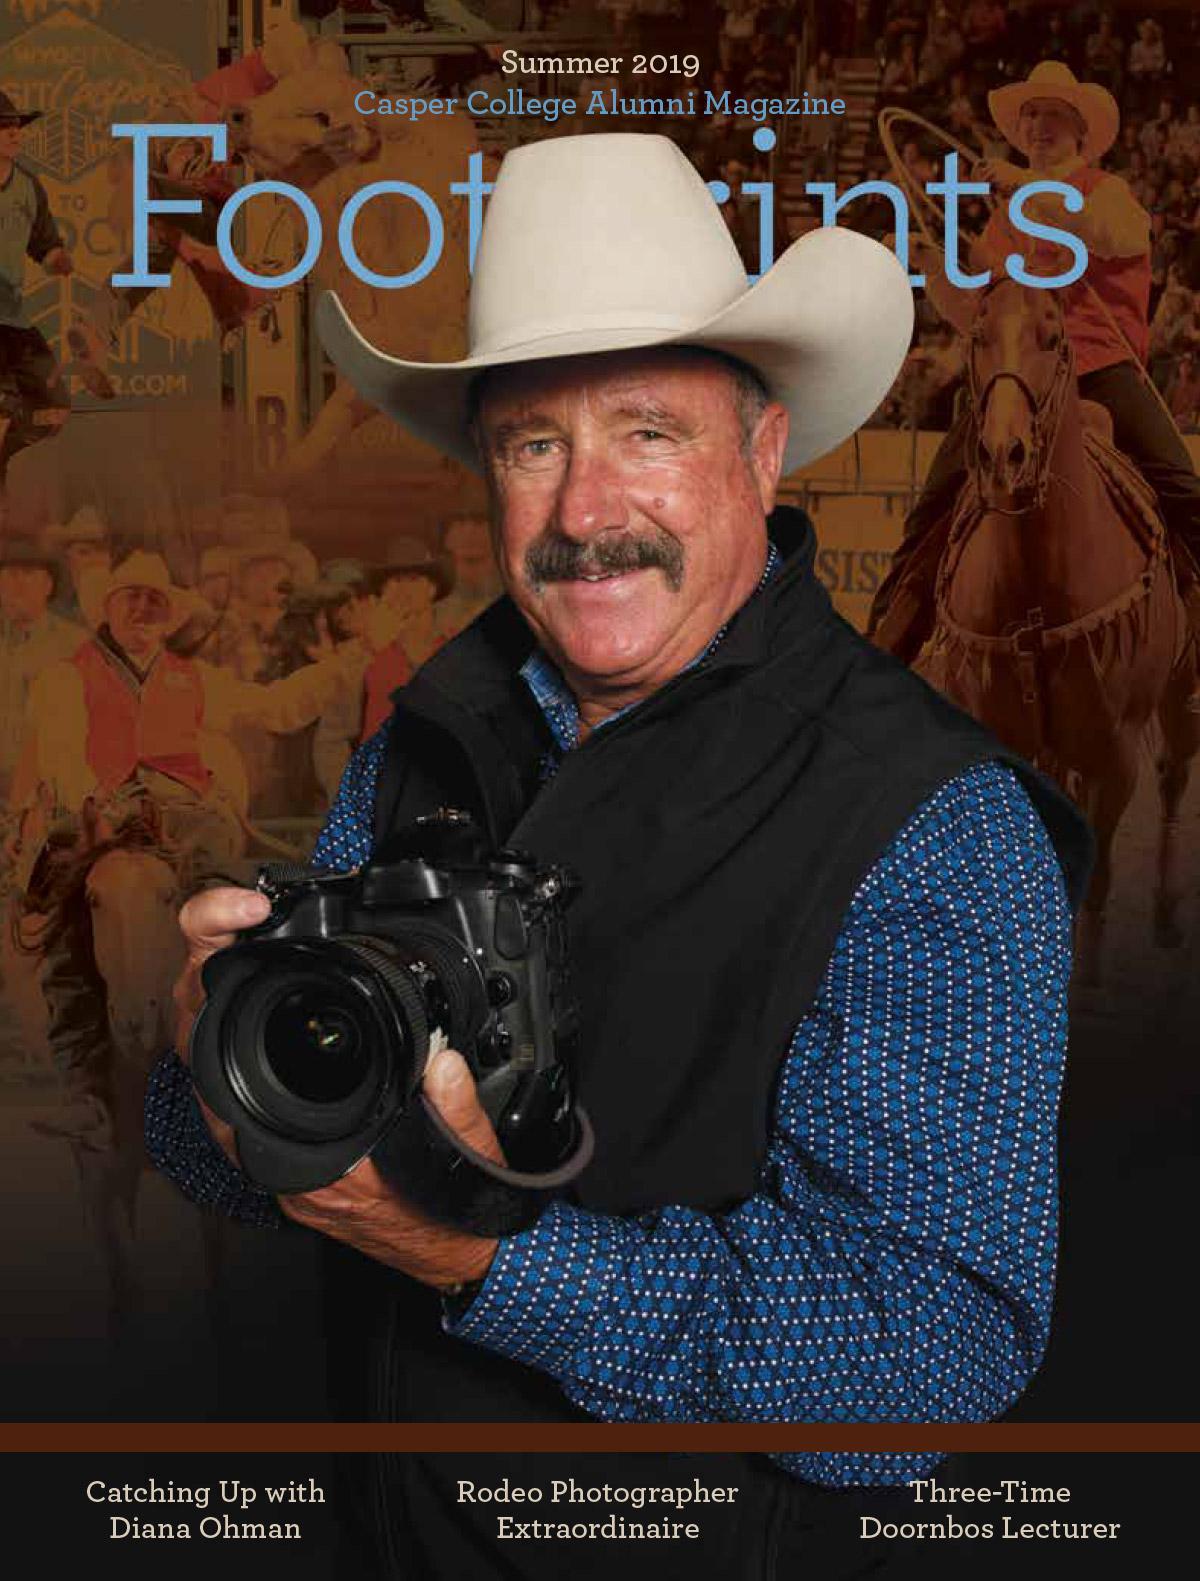 Footprints Magazine - Summer 2019 cover image